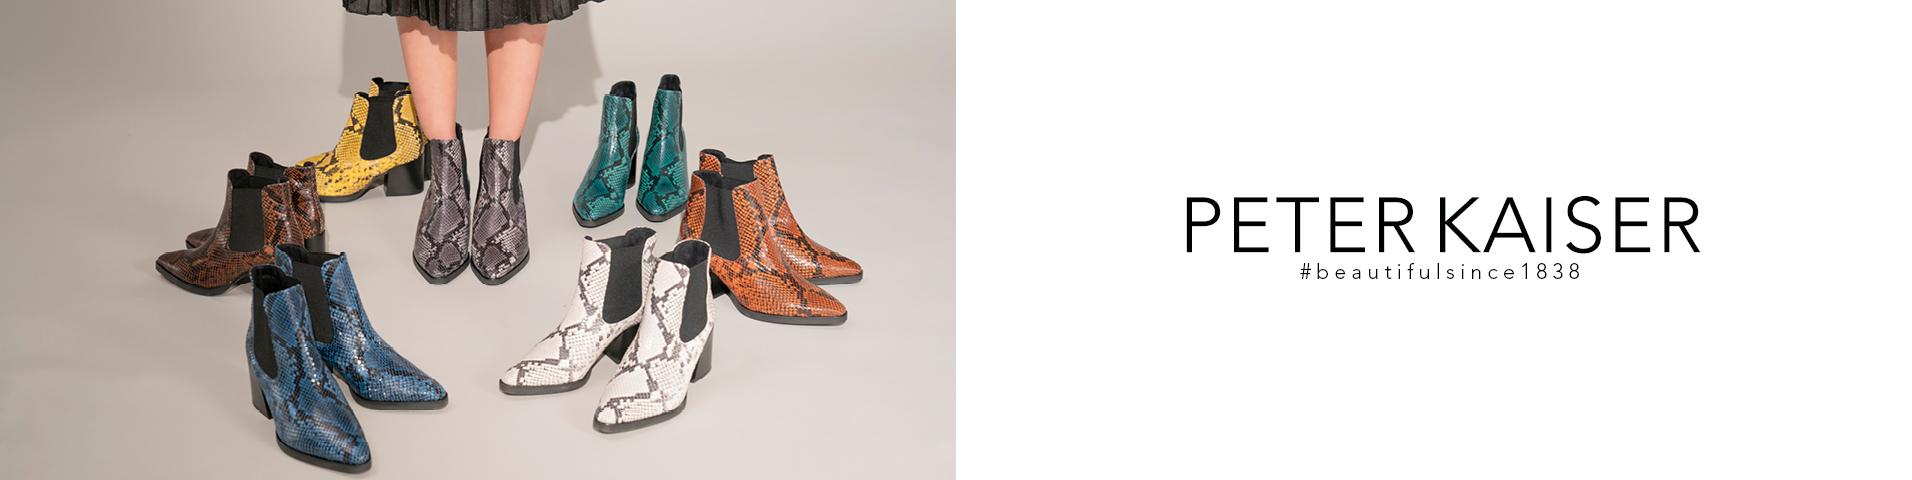 huge discount 60a7d ad7ba Peter Kaiser Schuhe online kaufen | Upgrade für deinen ...